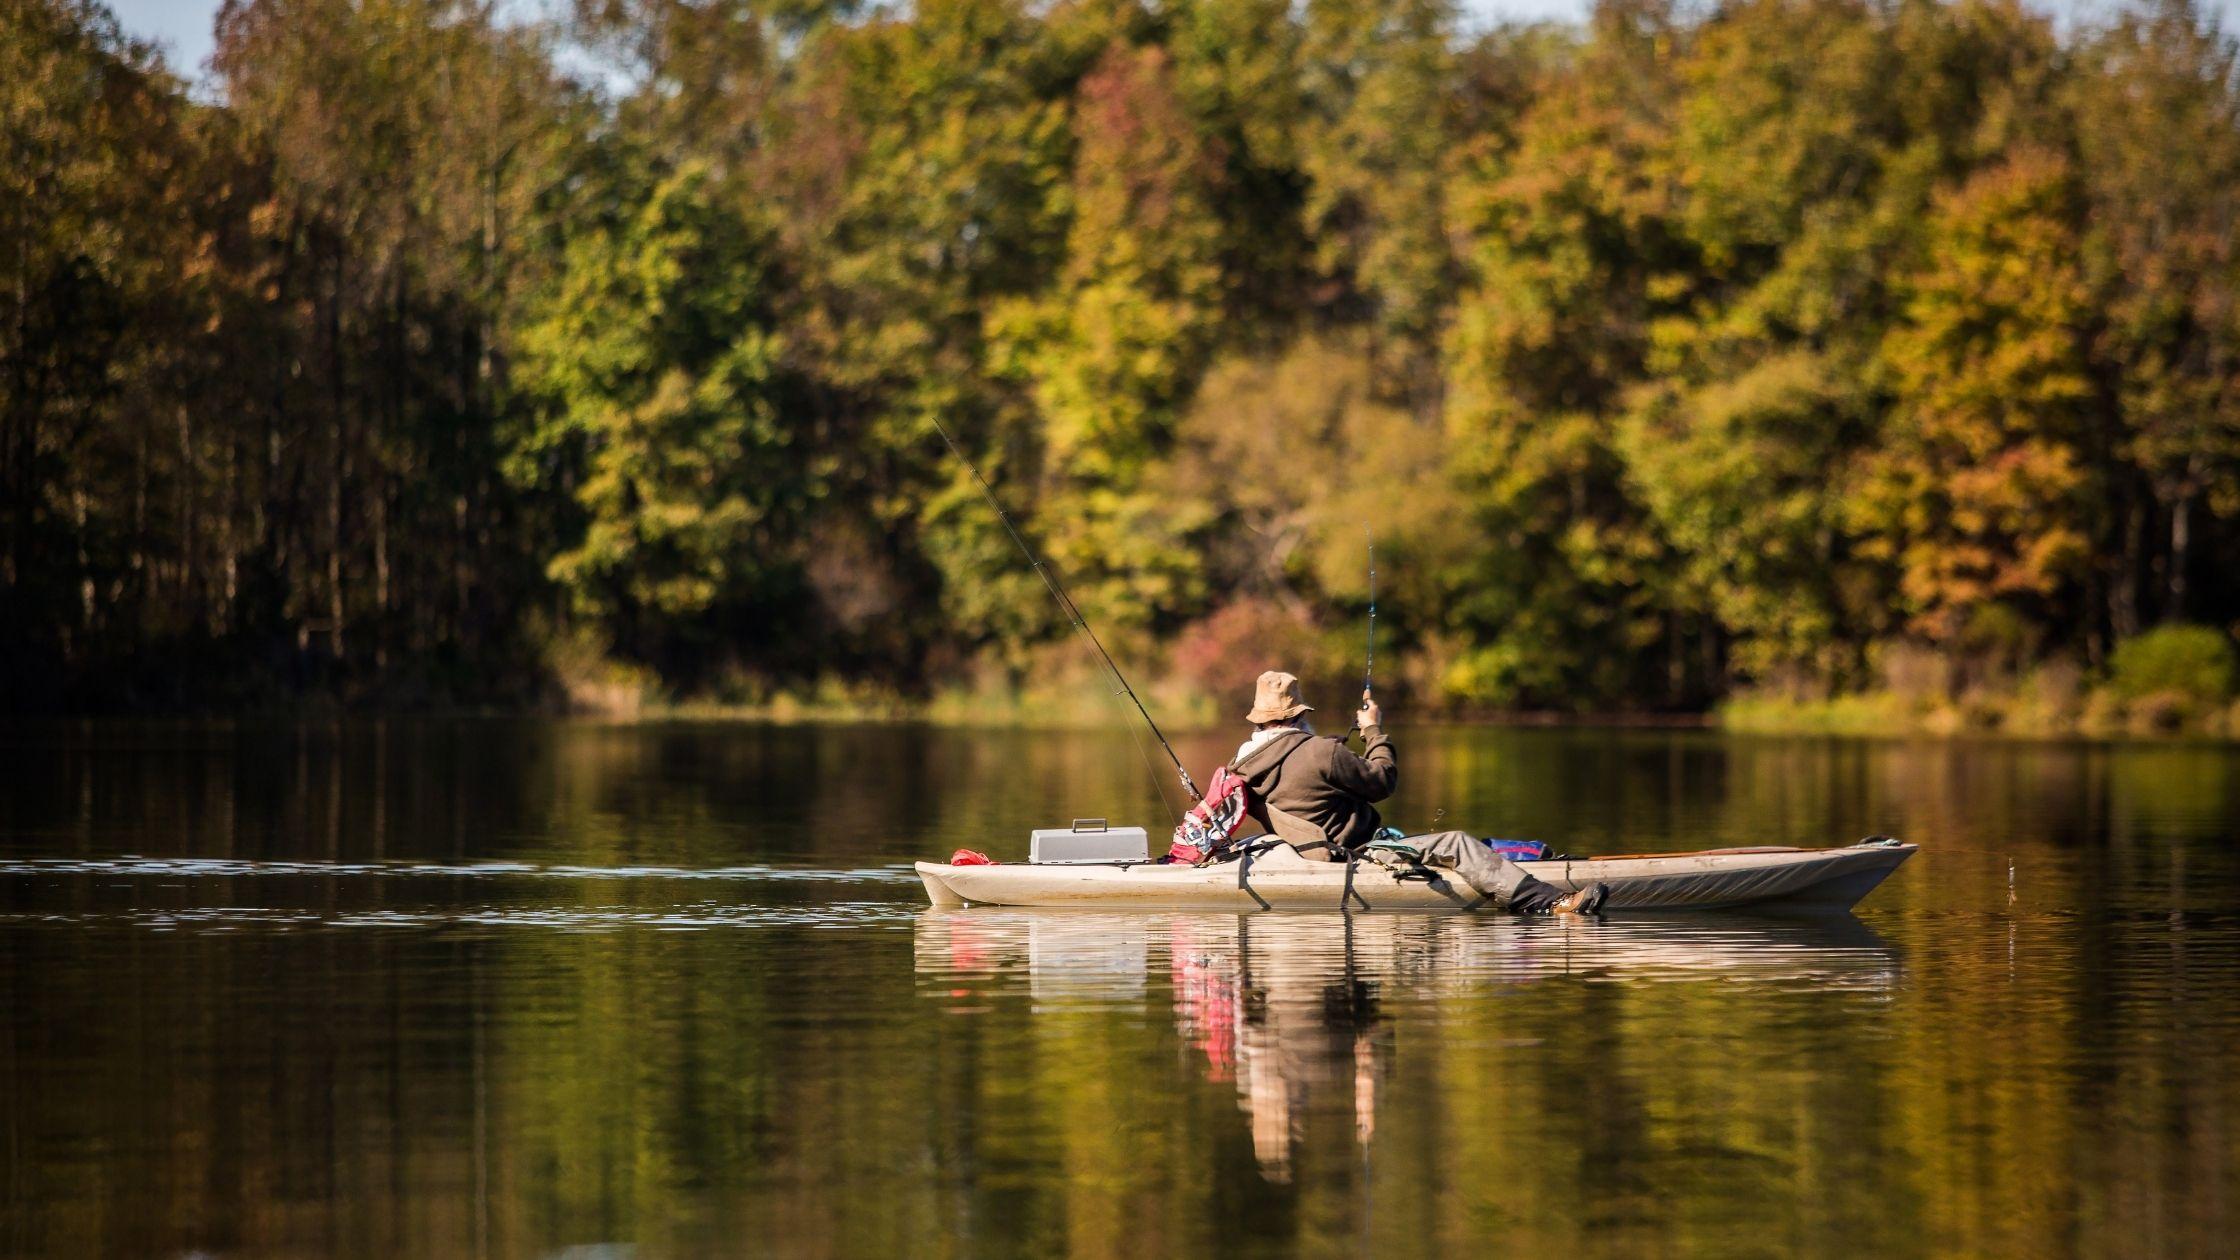 kayak fishing for beginners